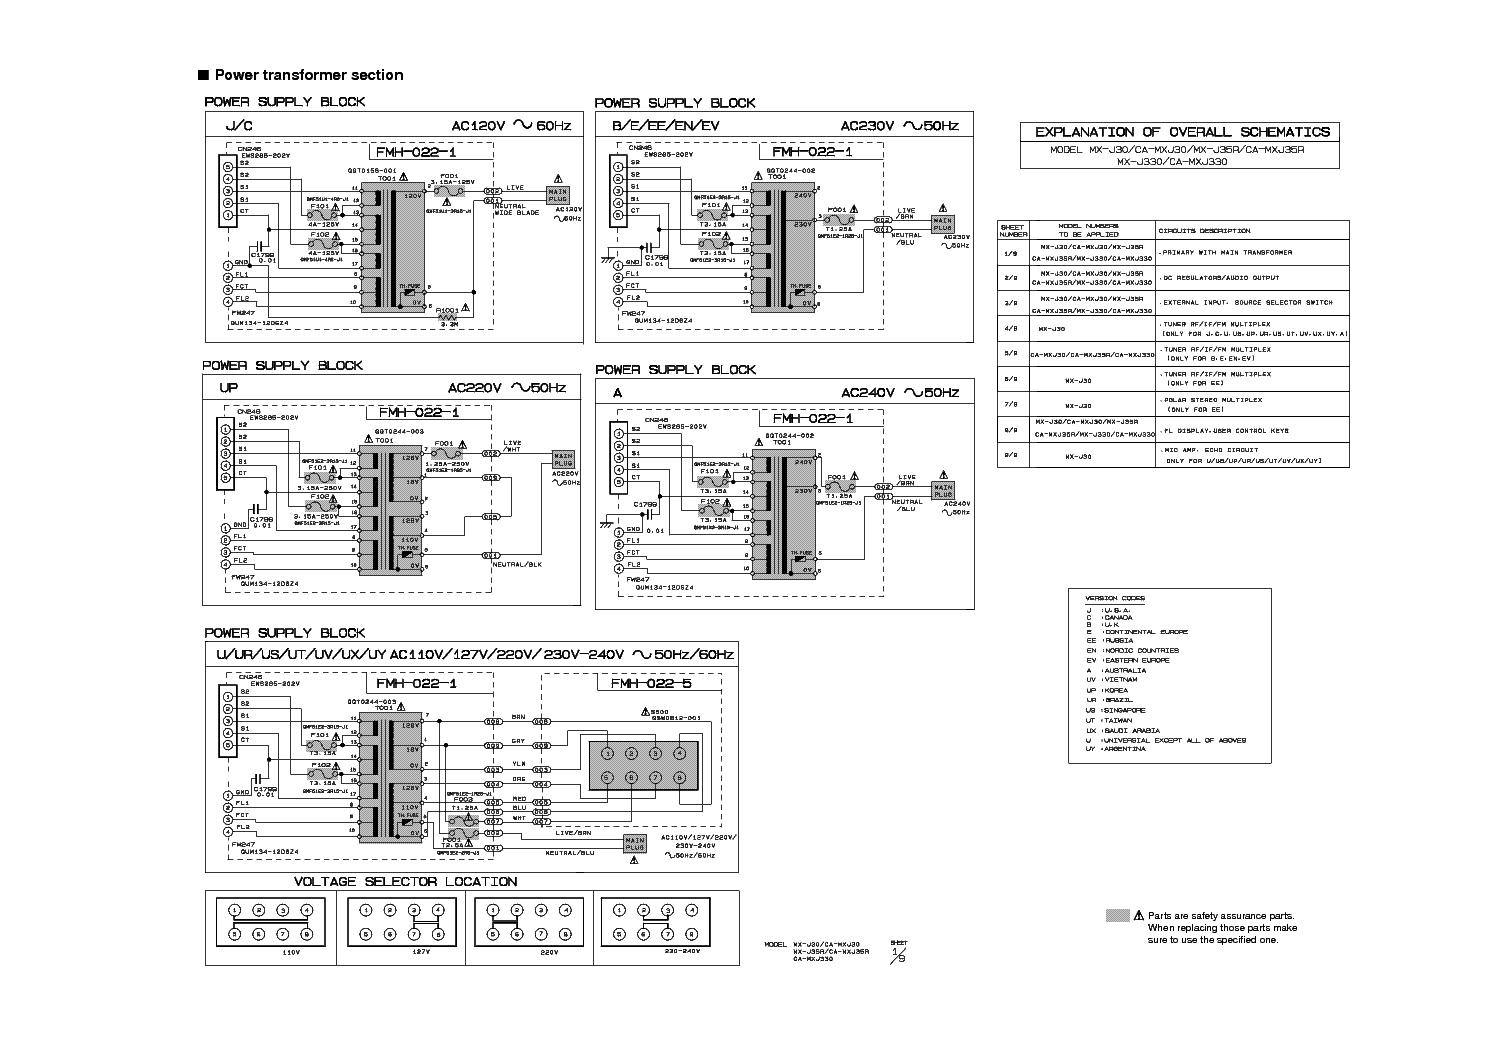 JVC CA-MXJ30 SCH service manual (1st page)